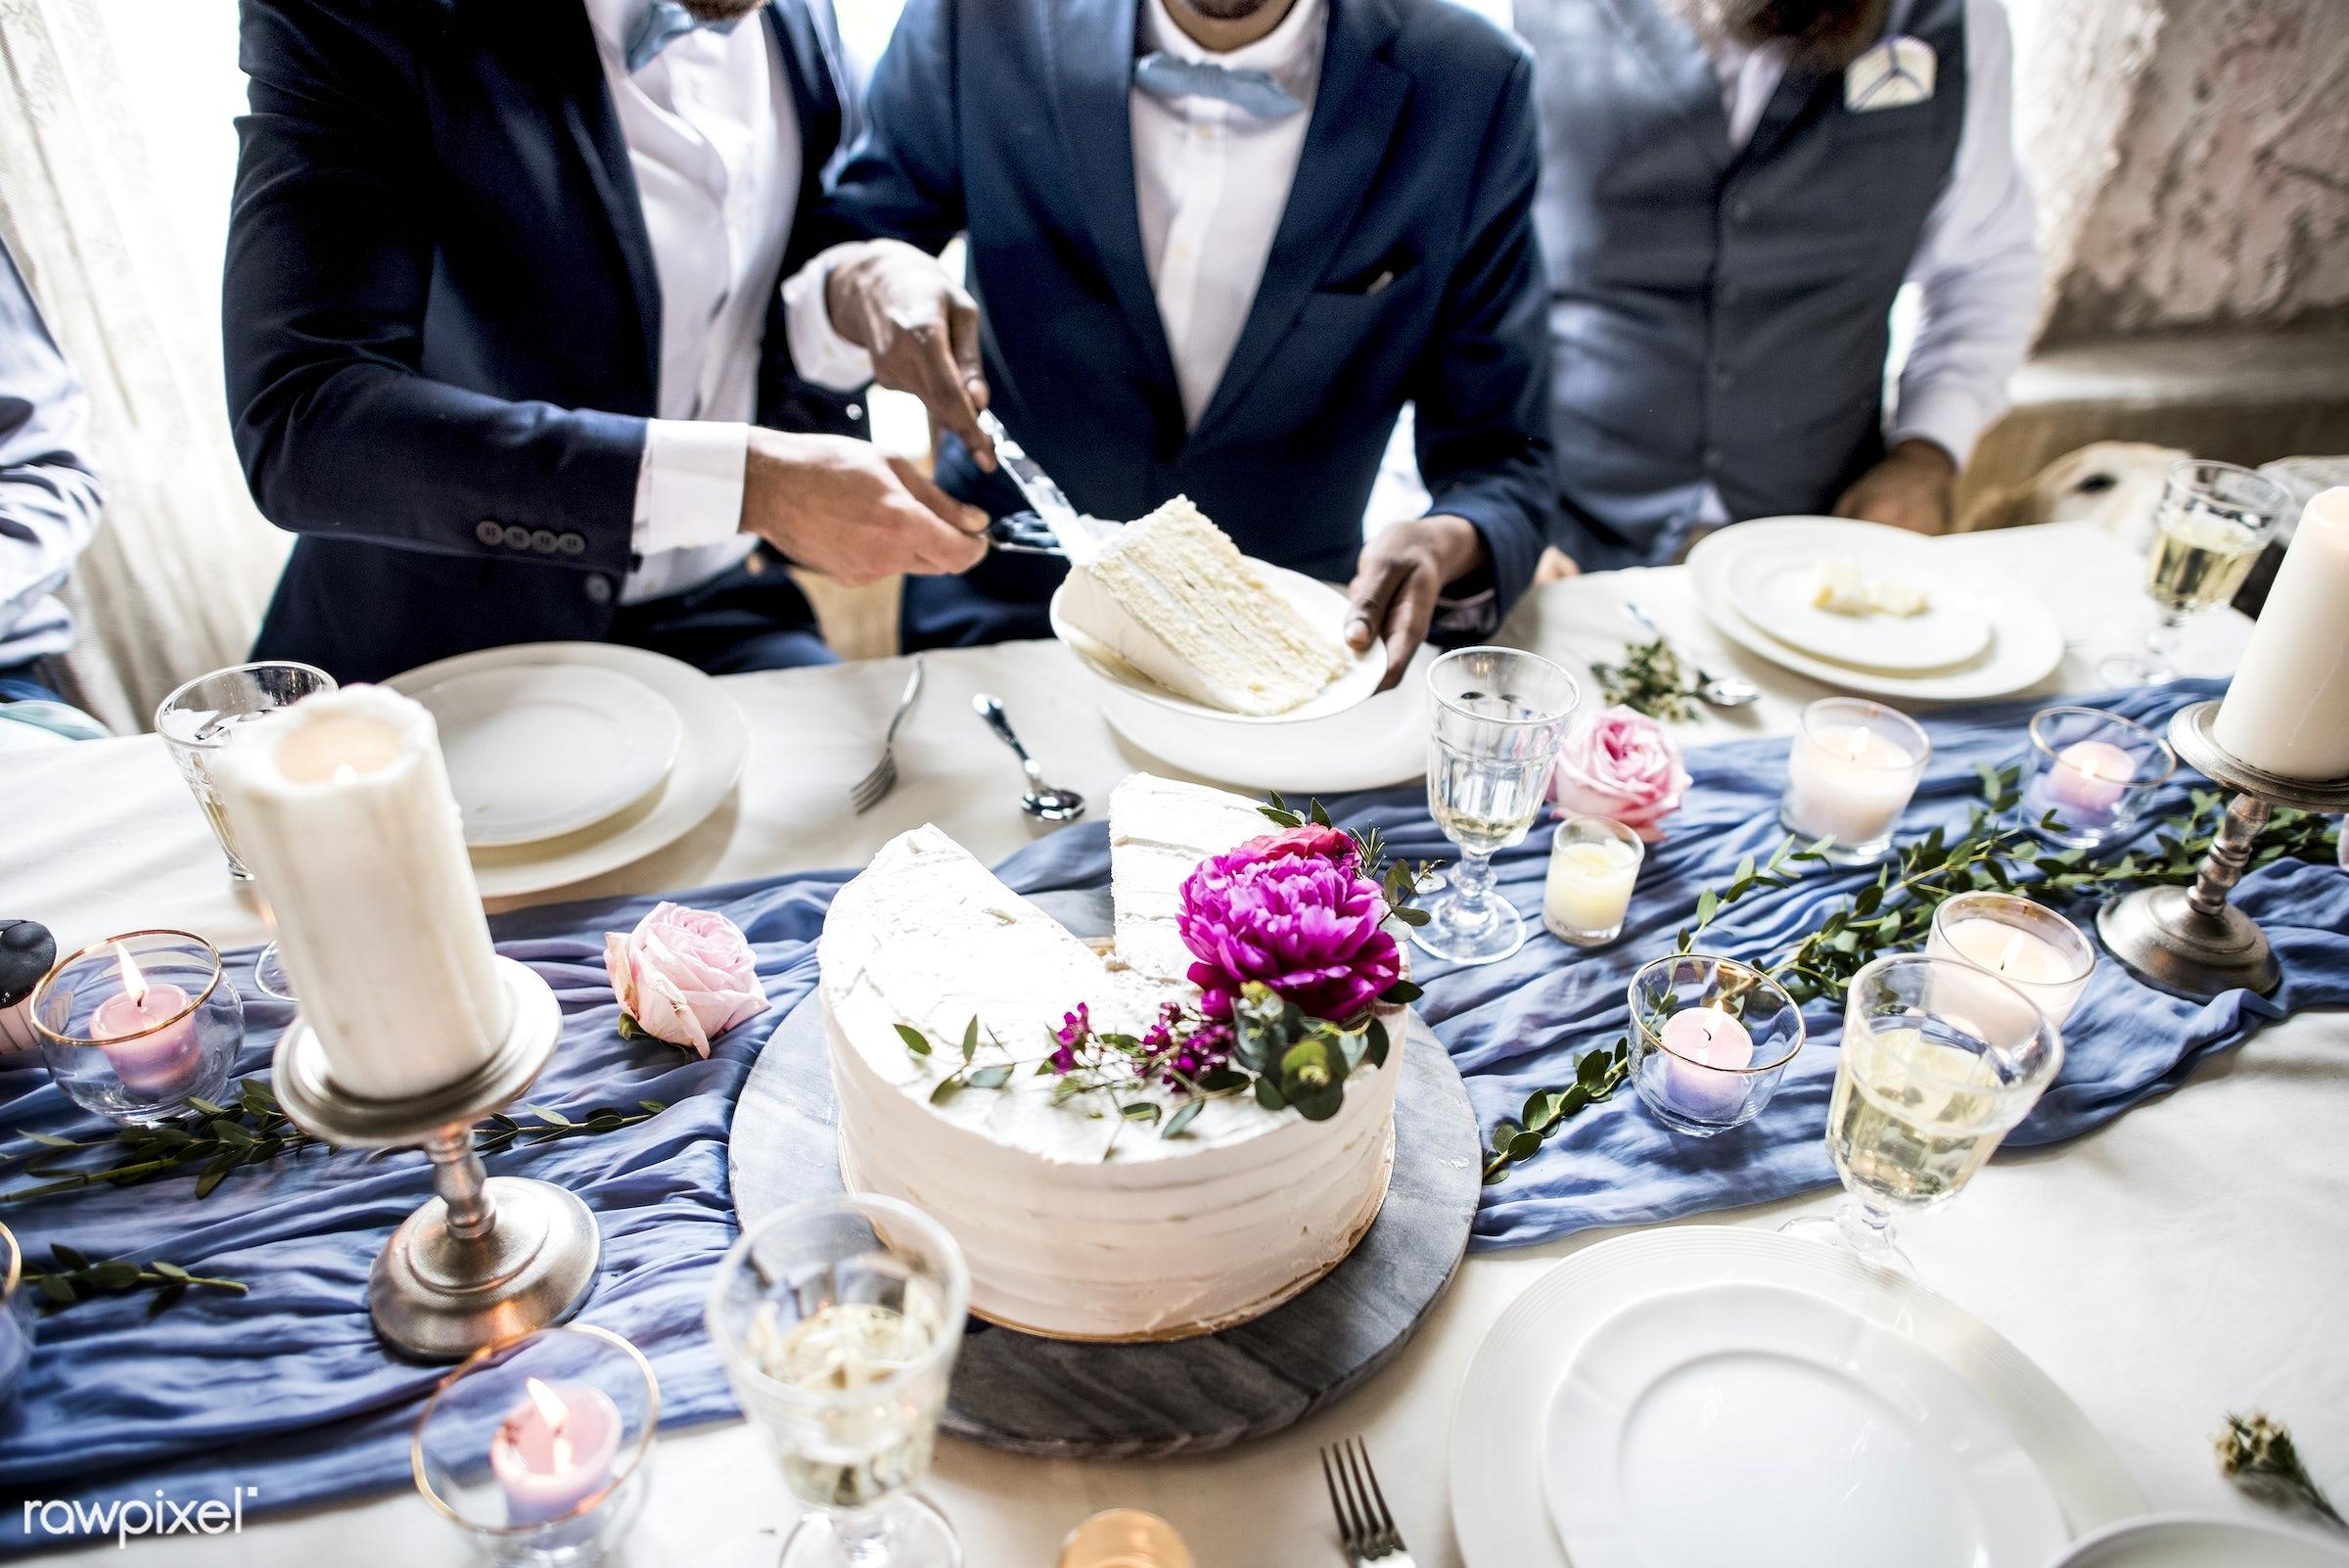 cake, celebrate, celebration, ceremony, closeup, congrats, congratulations, couple, cut, dessert, diversity, elegance, event...